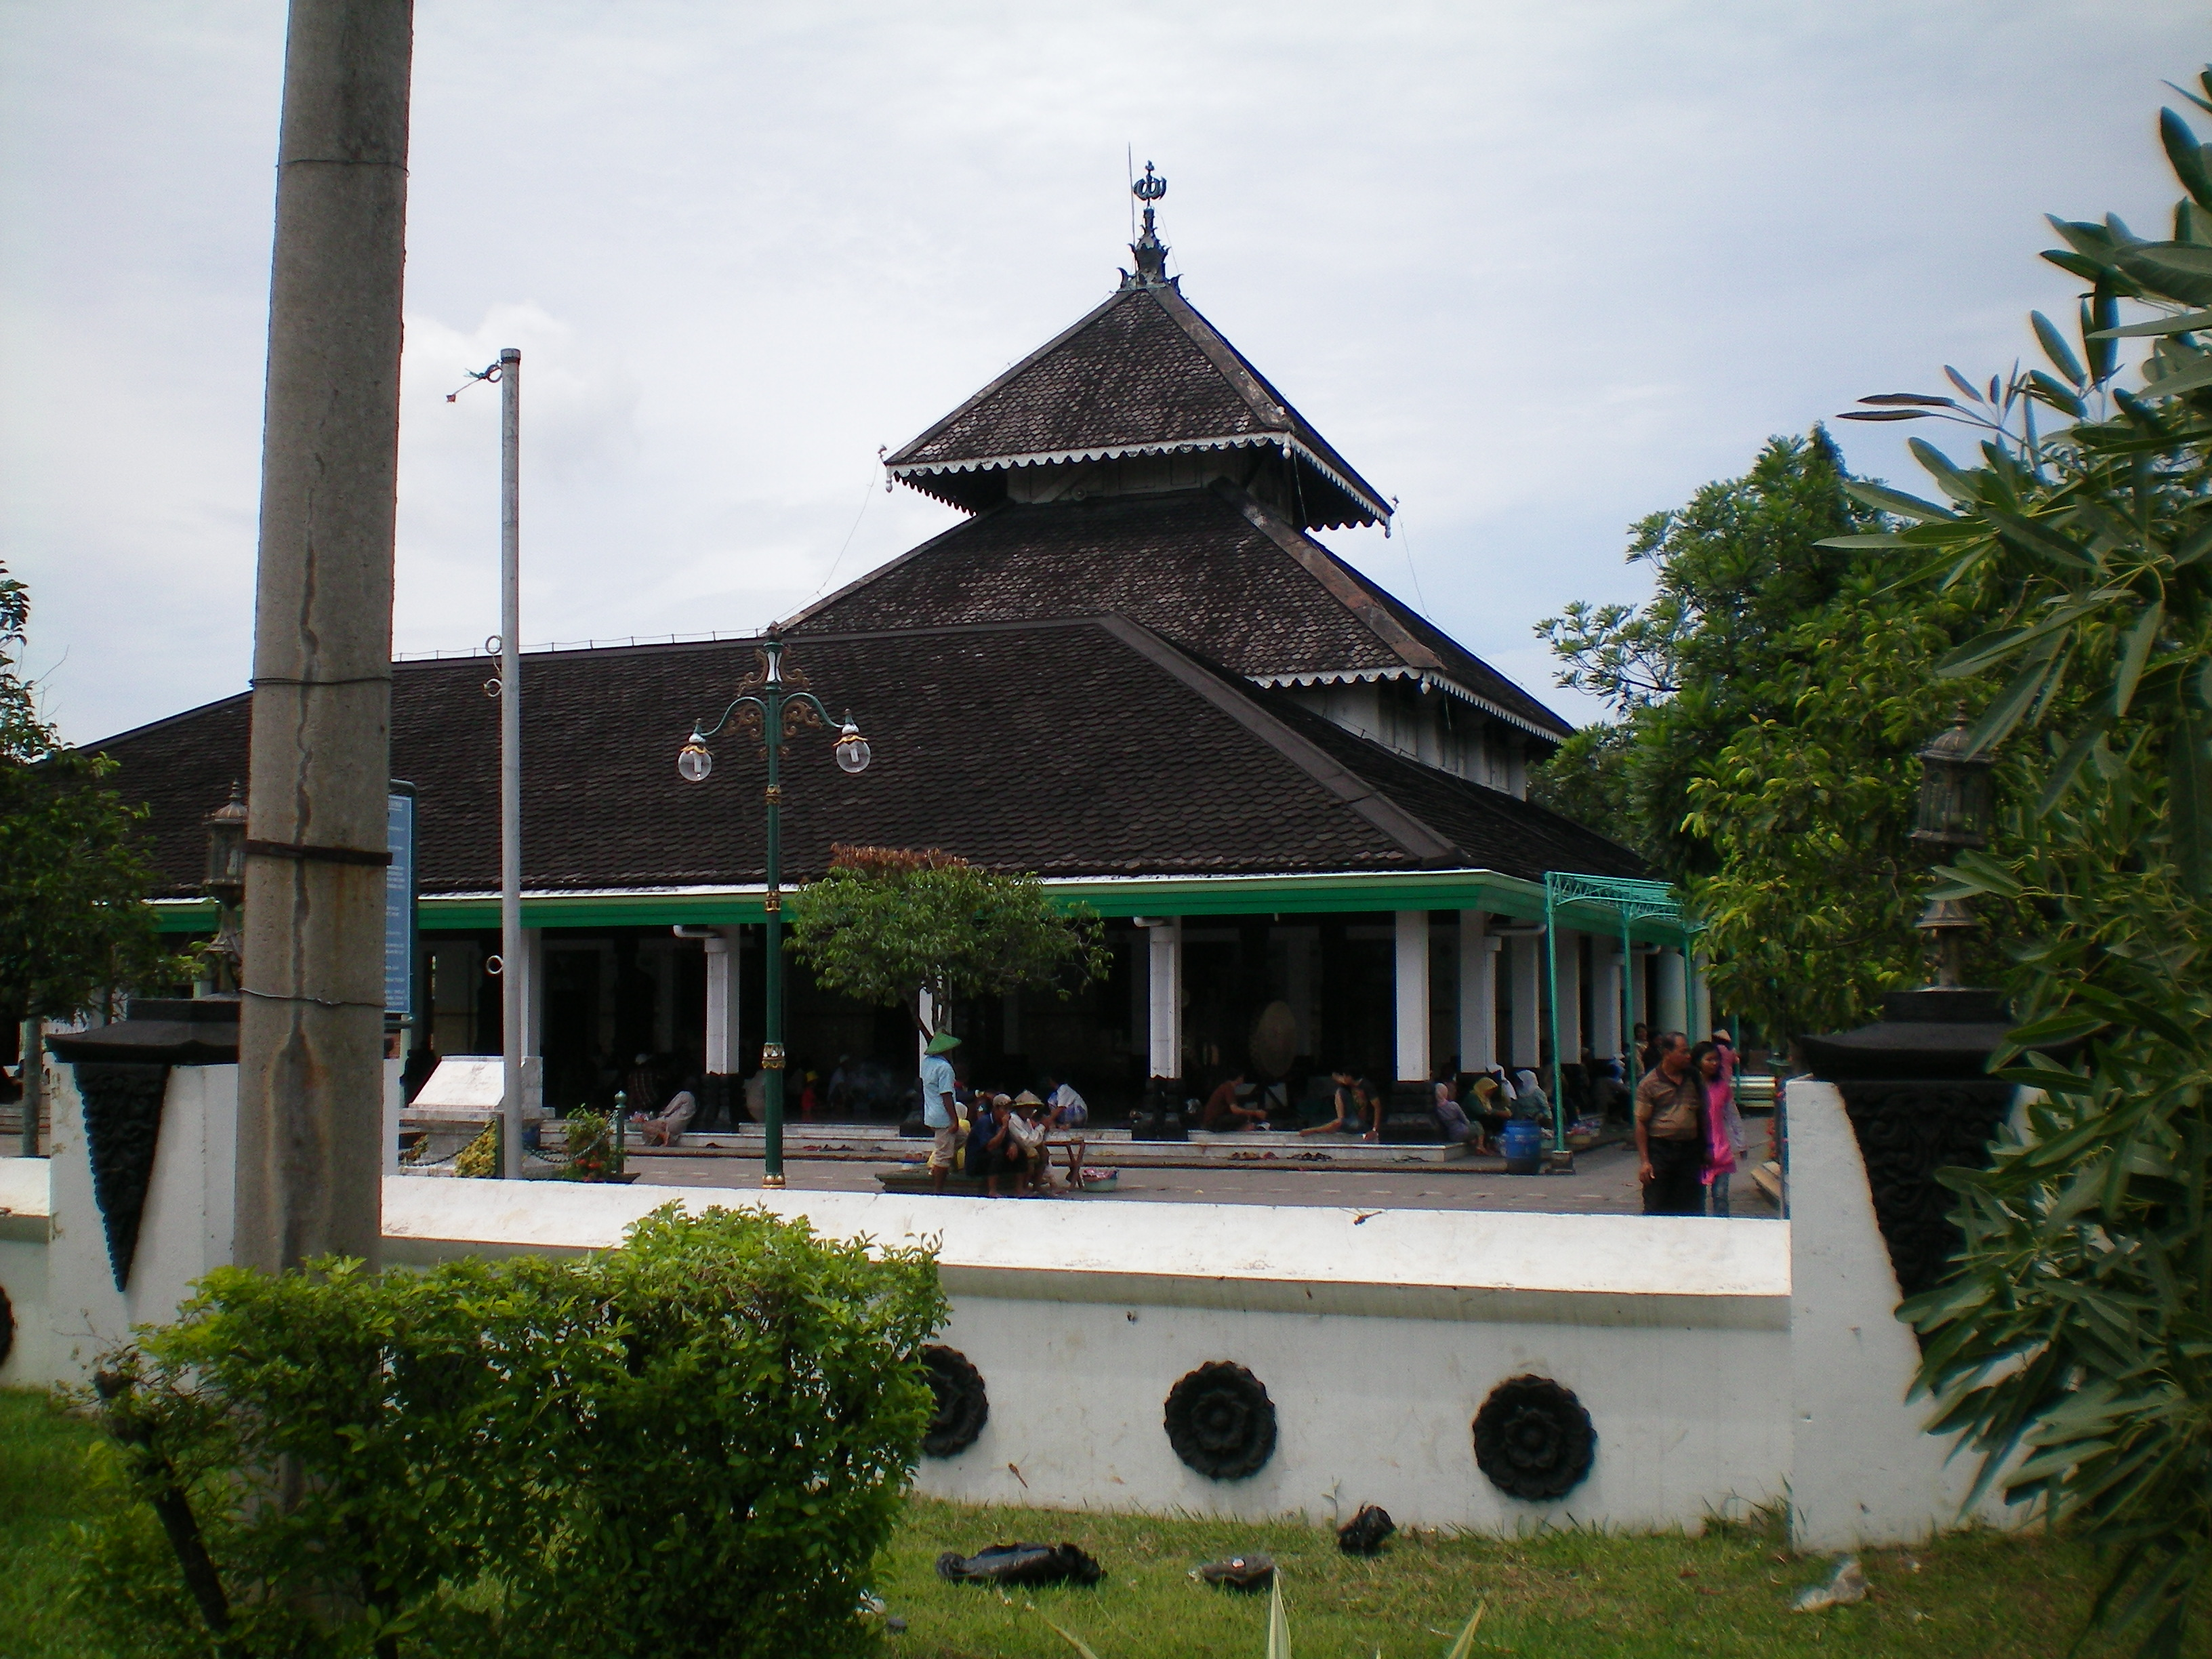 Wisata Religi Islam Di Surabaya